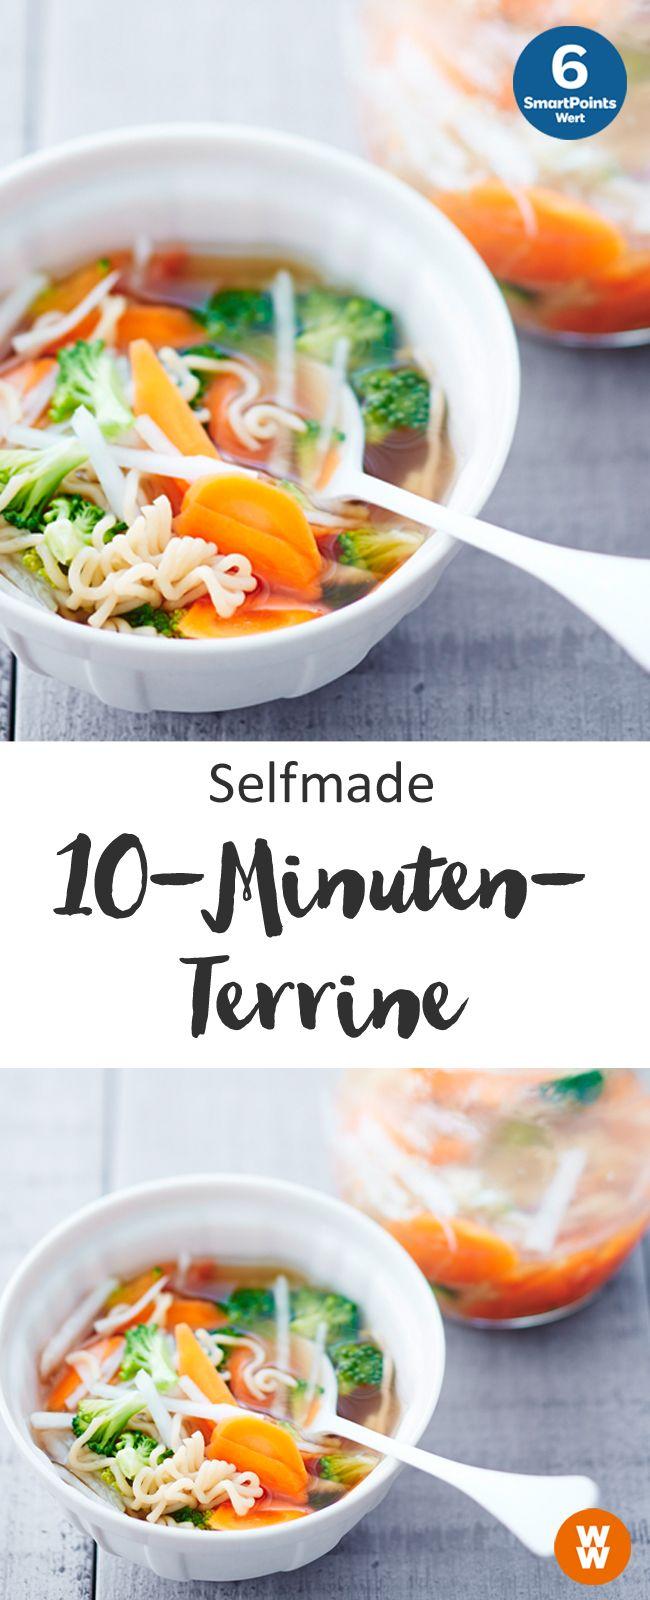 Selfmade-10-Minuten-Terrine, 6 SmartPoints/Portion, Suppe, Weight Watchers, fertig in 15 min.